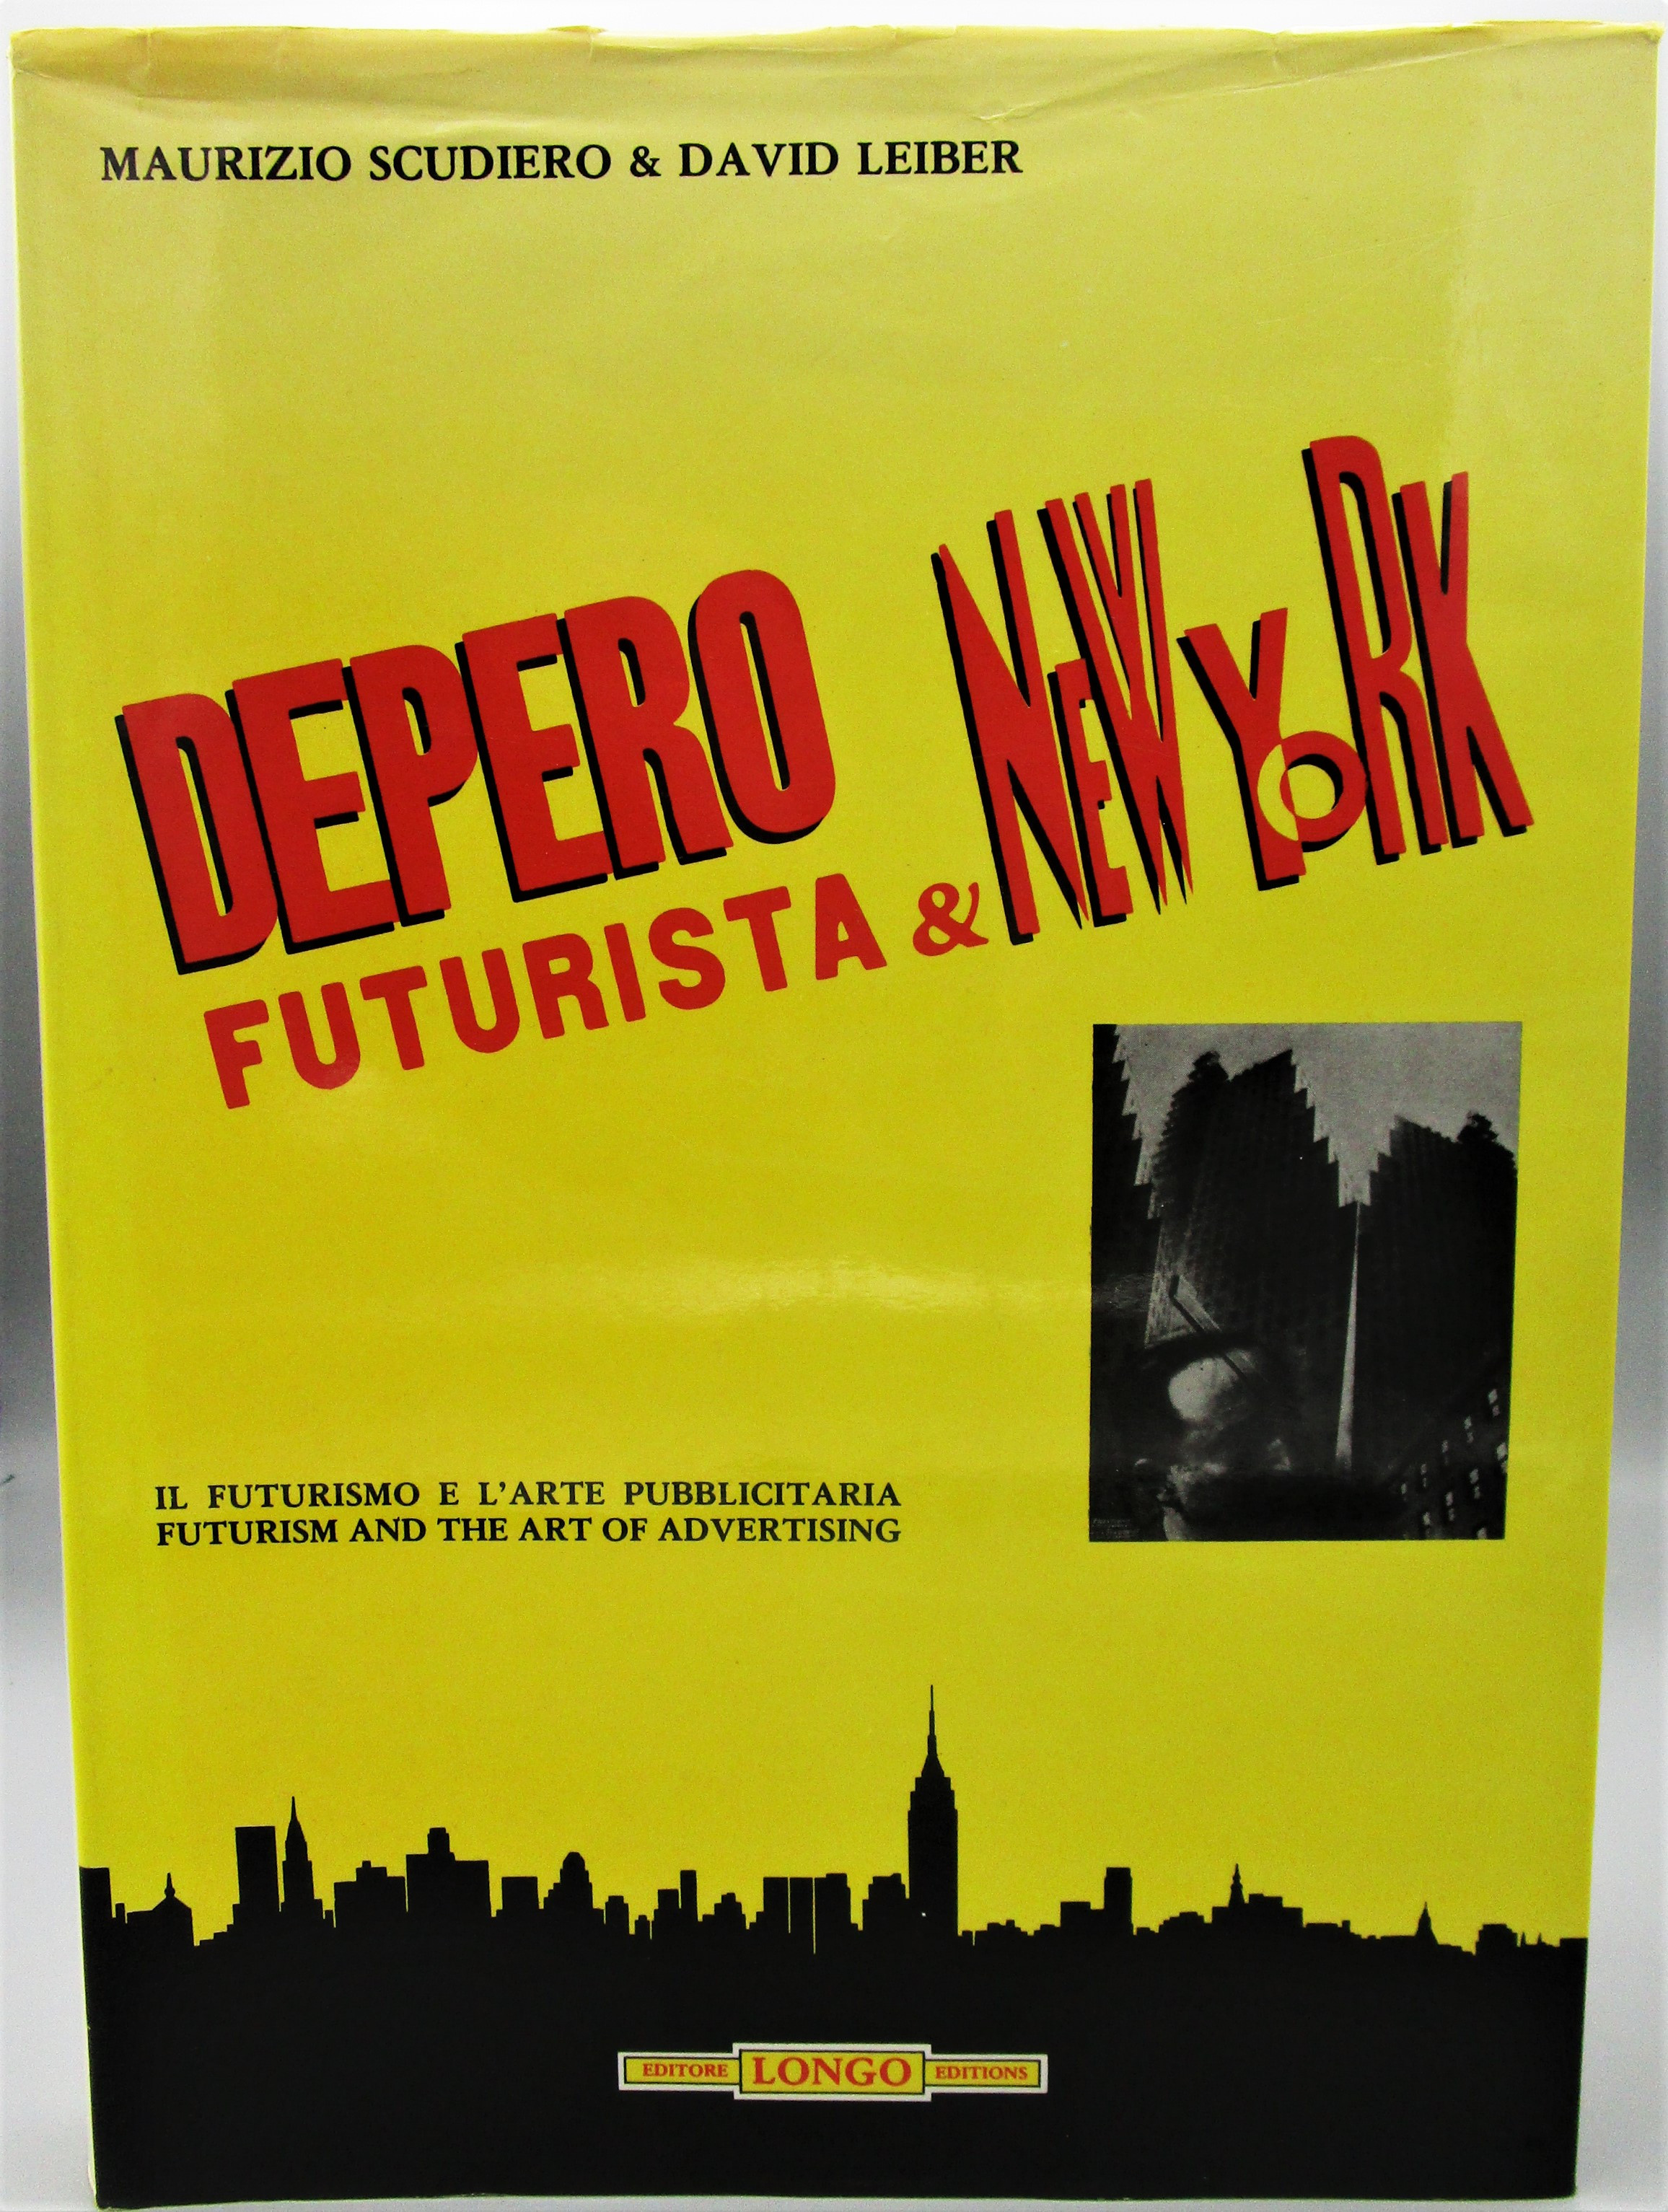 DEPERO FUTURISTA & NEW YORK, by Maurio Scudiero & David Leiber - 1986